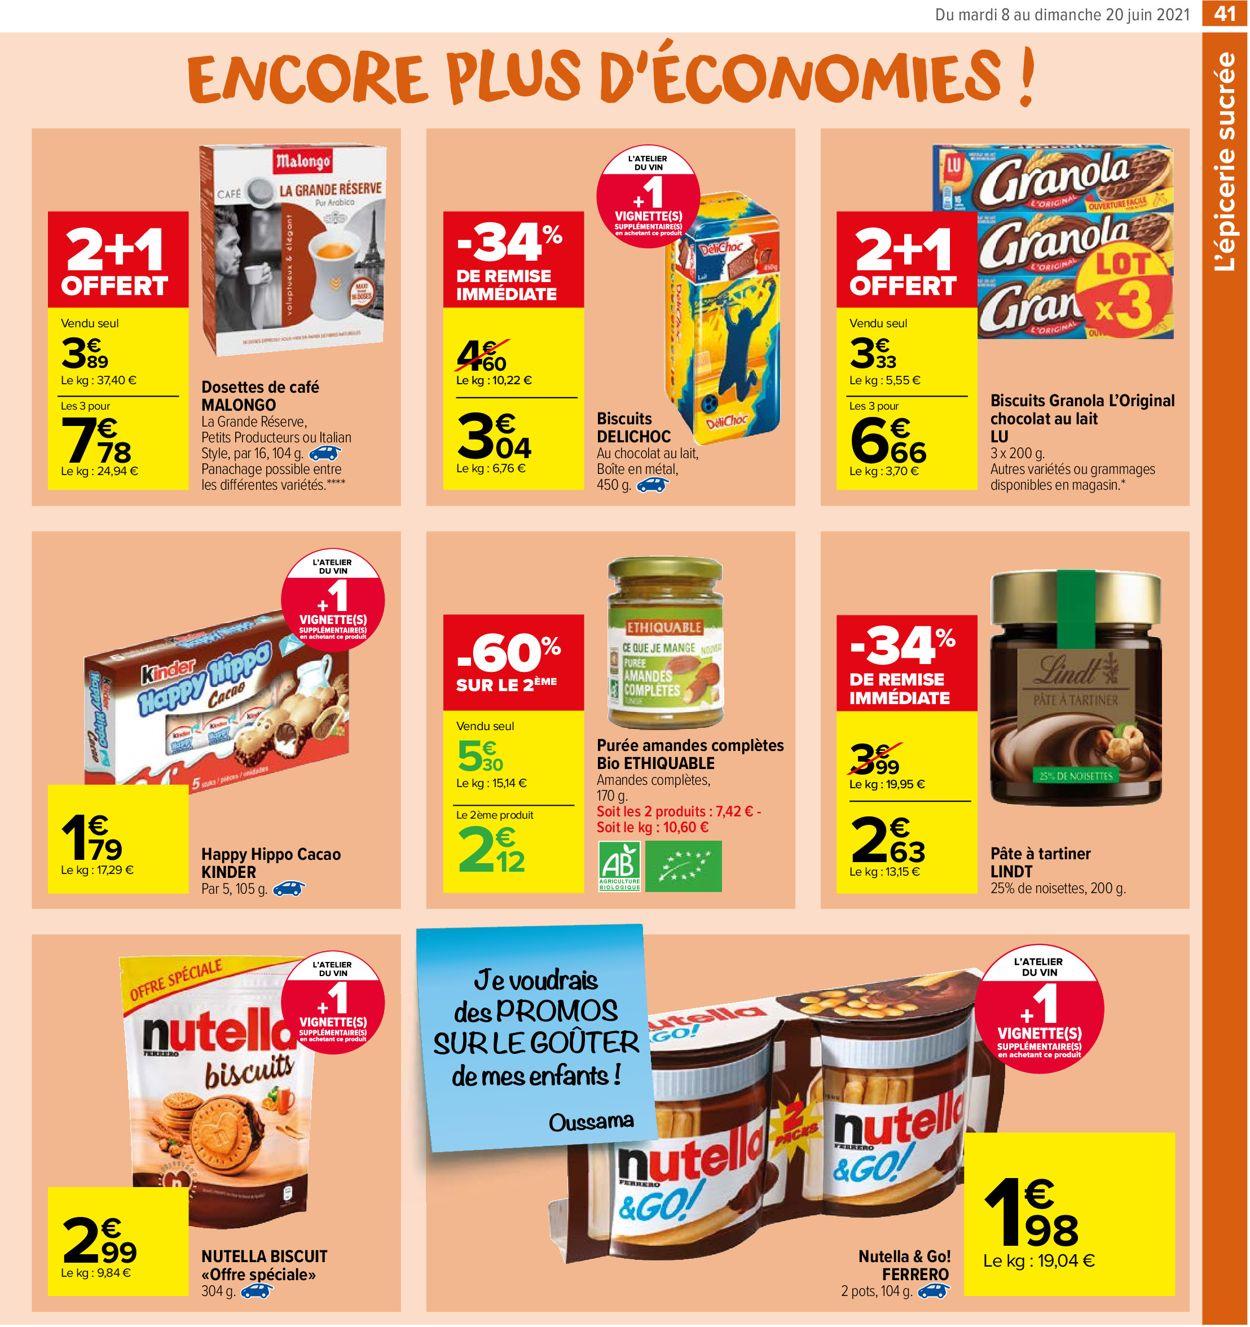 Carrefour Catalogue - 08.06-20.06.2021 (Page 41)